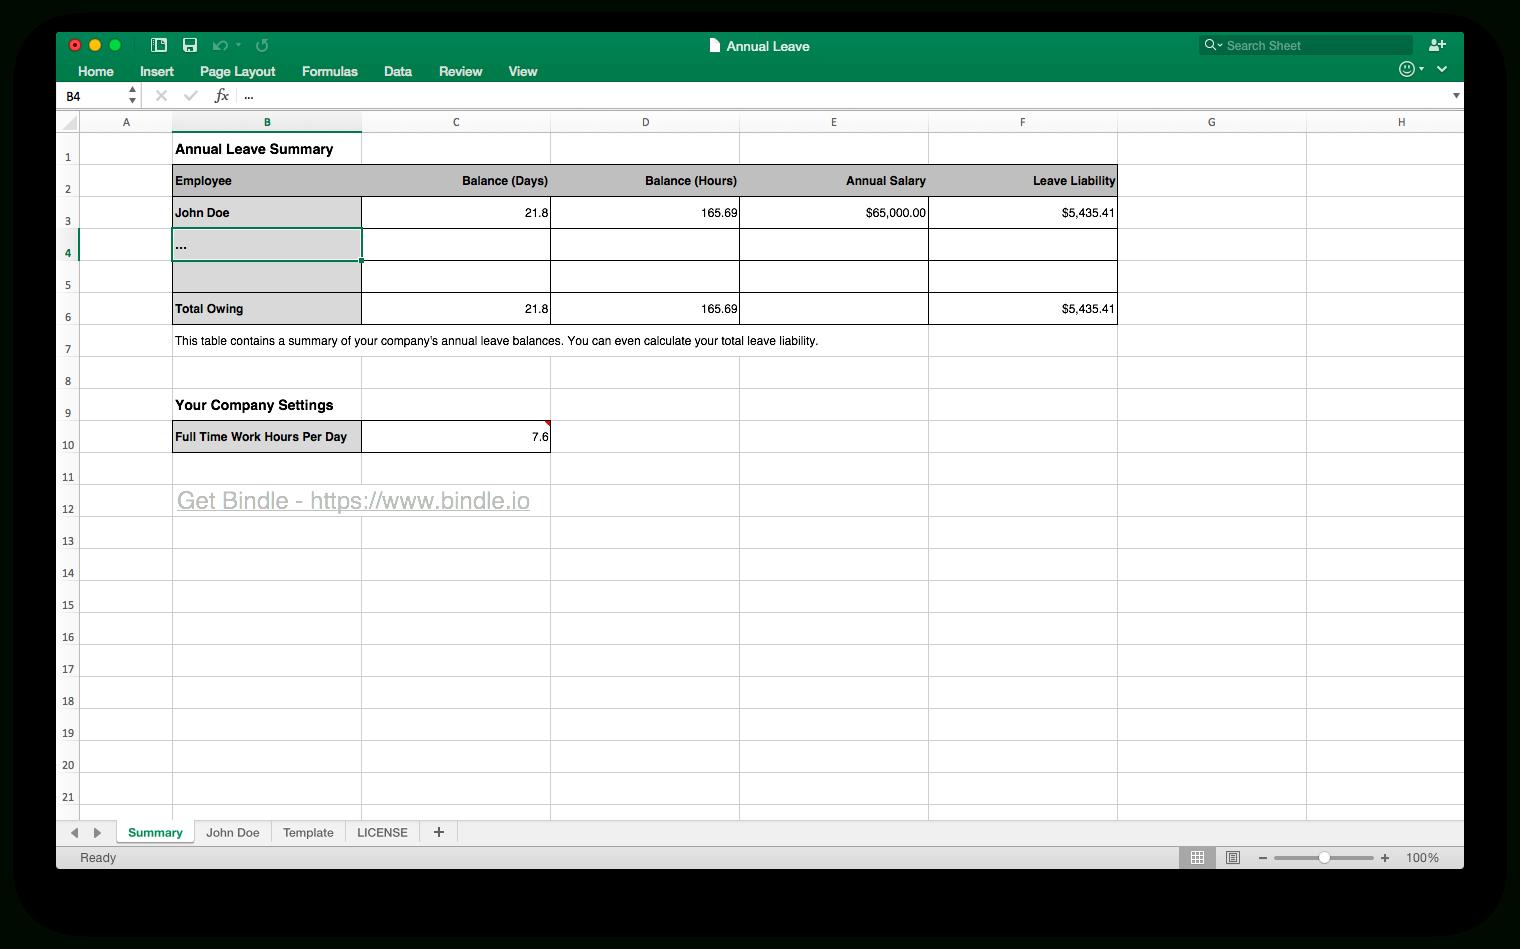 Annual Leave Spreadsheet Regarding Free Annual Leave Spreadsheet  Bindle